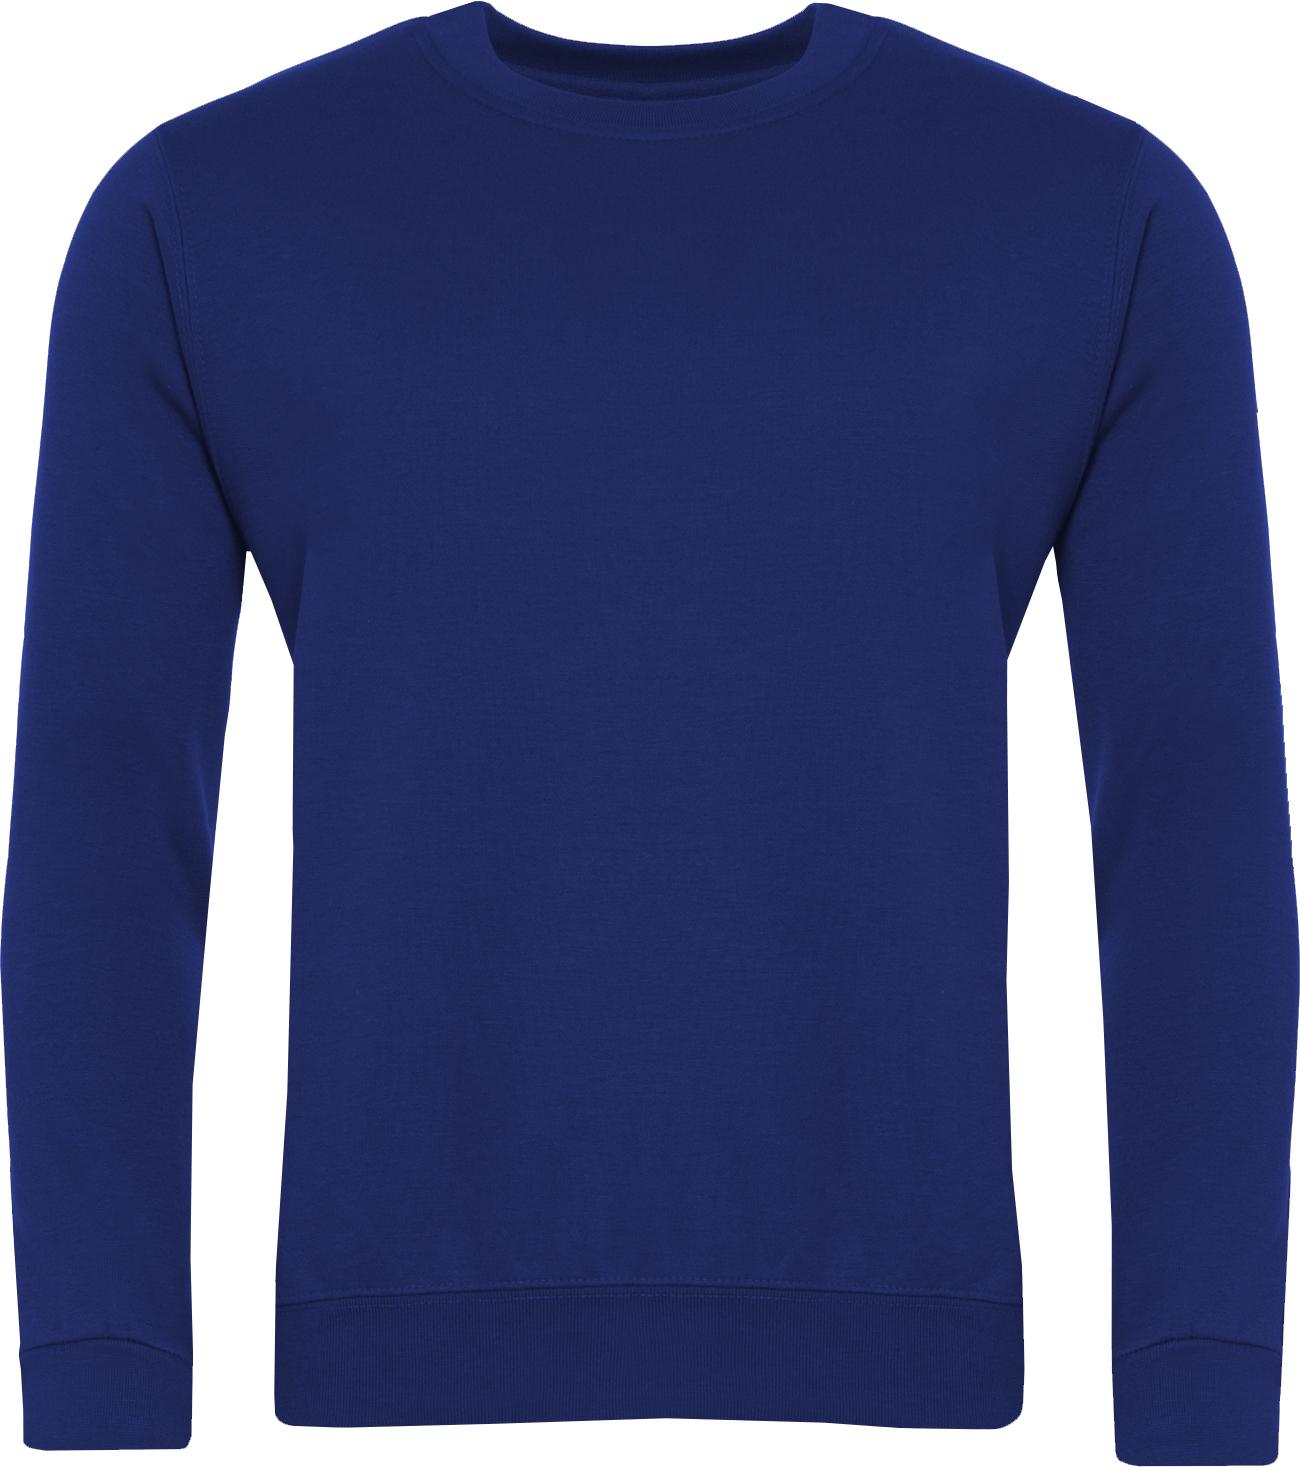 Braidbar Nursery Round Neck Sweatshirt